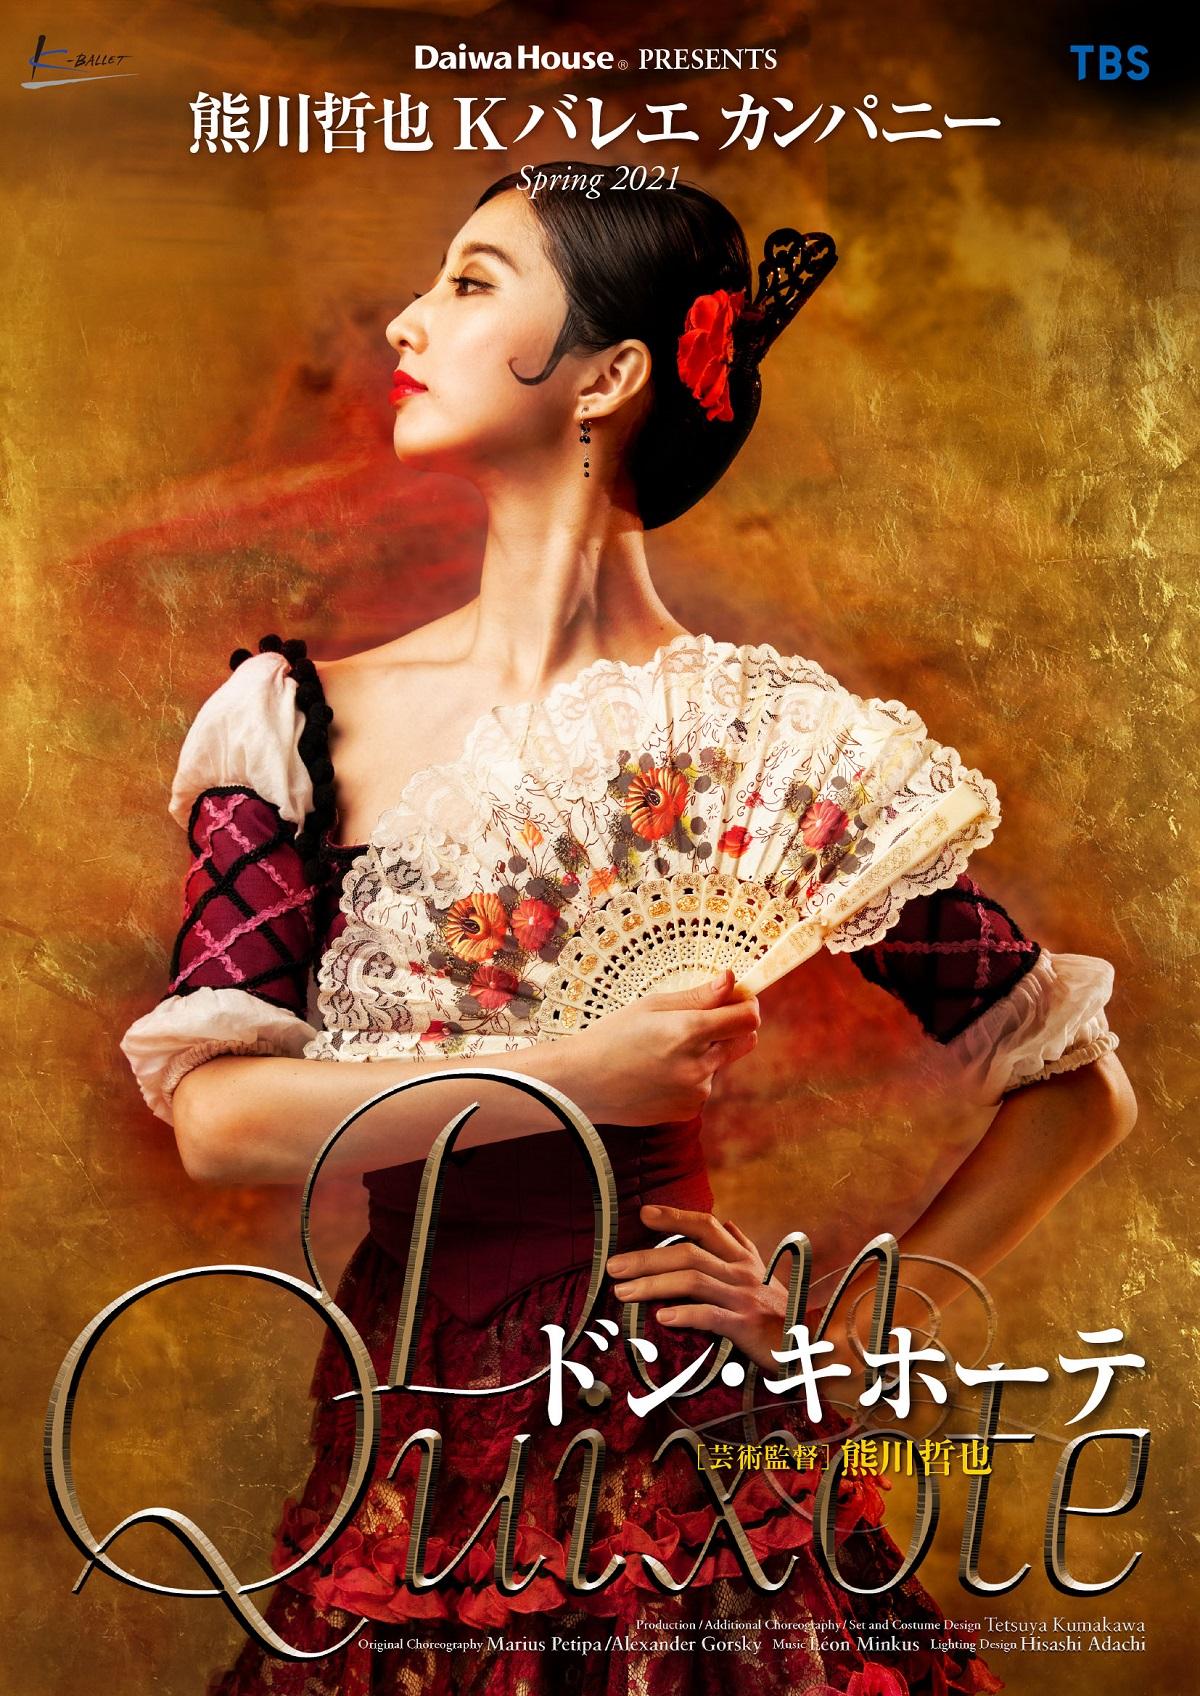 [Streaming+] Daiwa House® PRESENTS Tetsuya Kumakawa K-BALLET COMPANY Spring 2021 「Don Quixote」